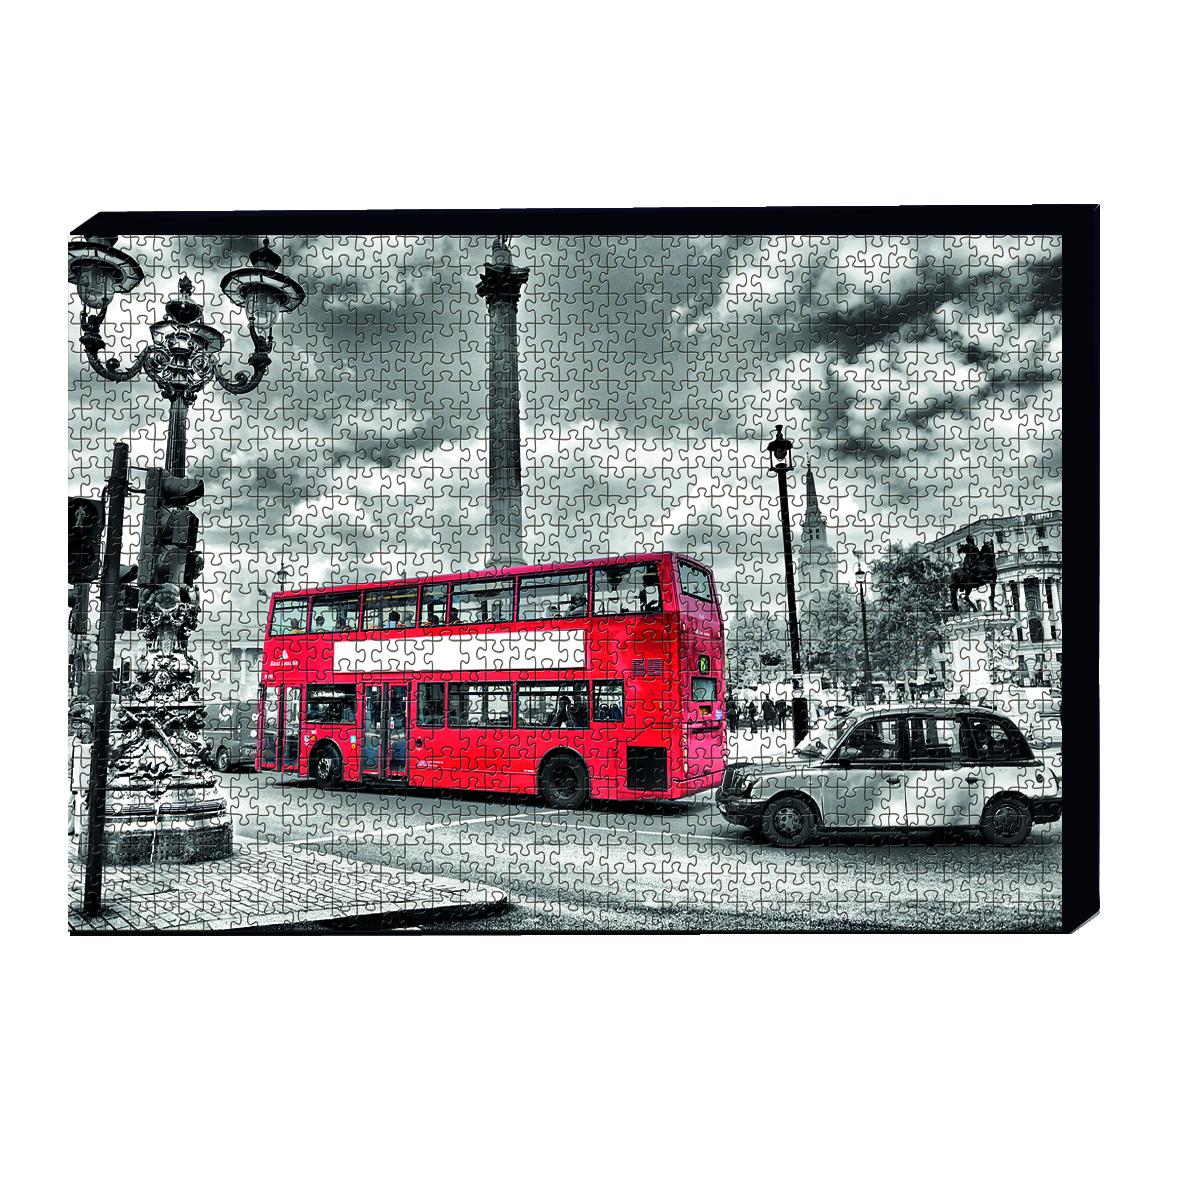 تابلو پازل 1000 تکه مدل اتوبوس لندن